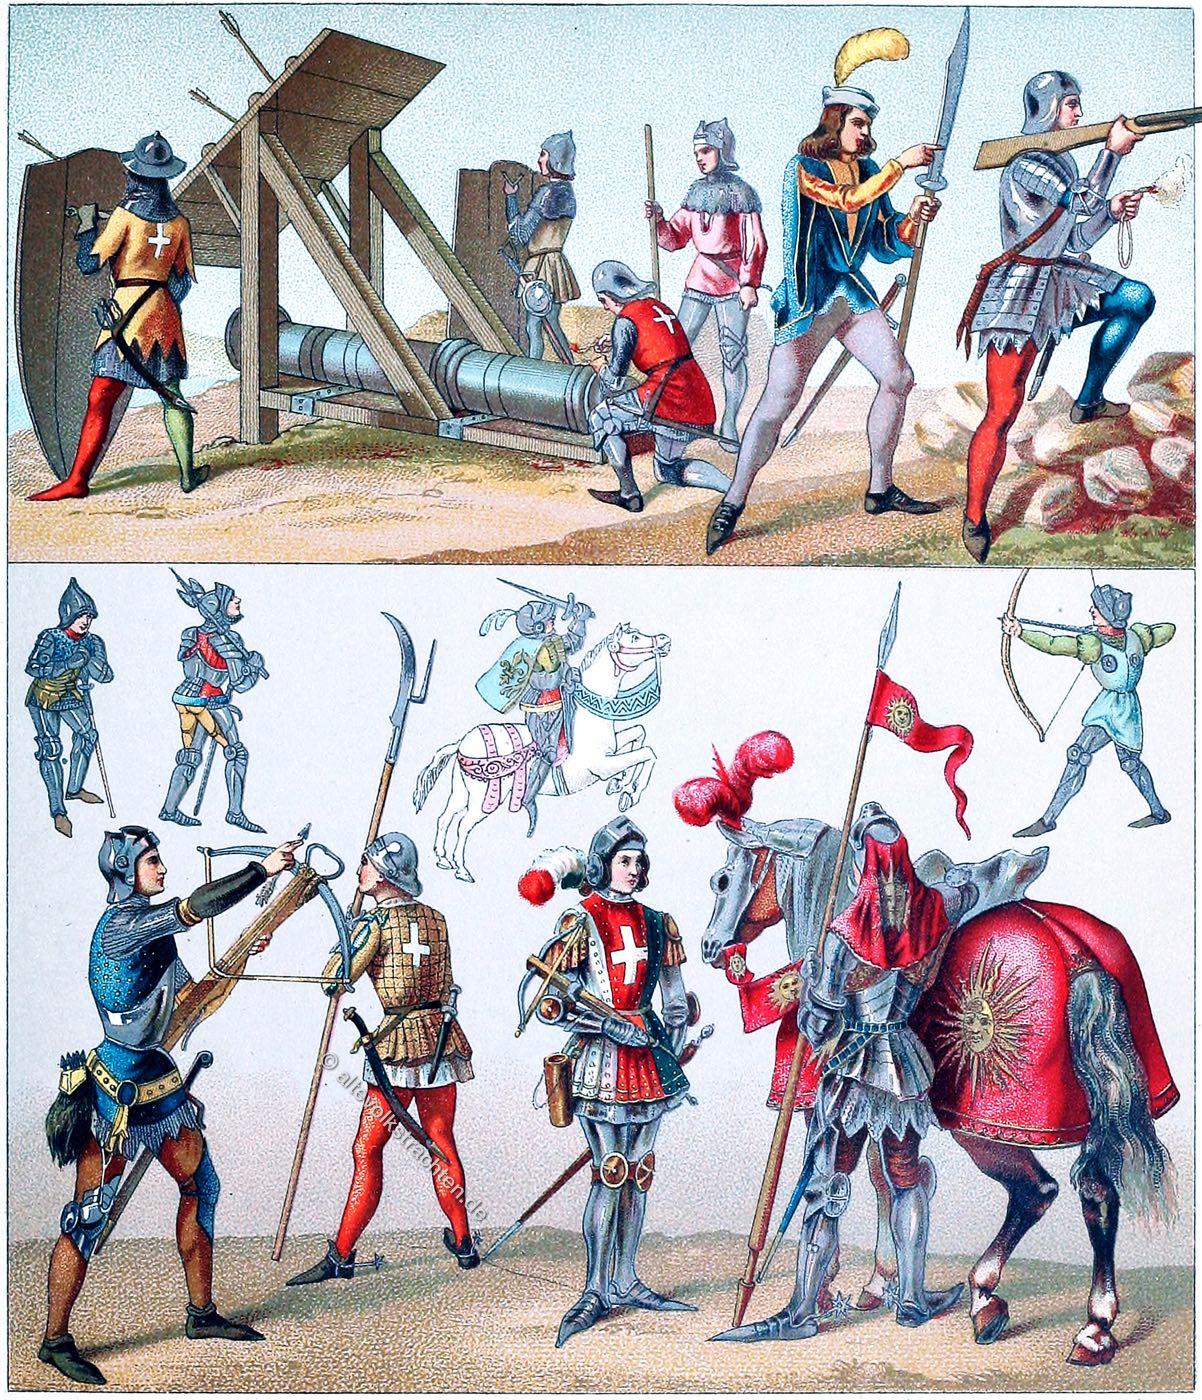 Artillerie, Mittelalter, Frankreich, Soldaten, Garde du Corps